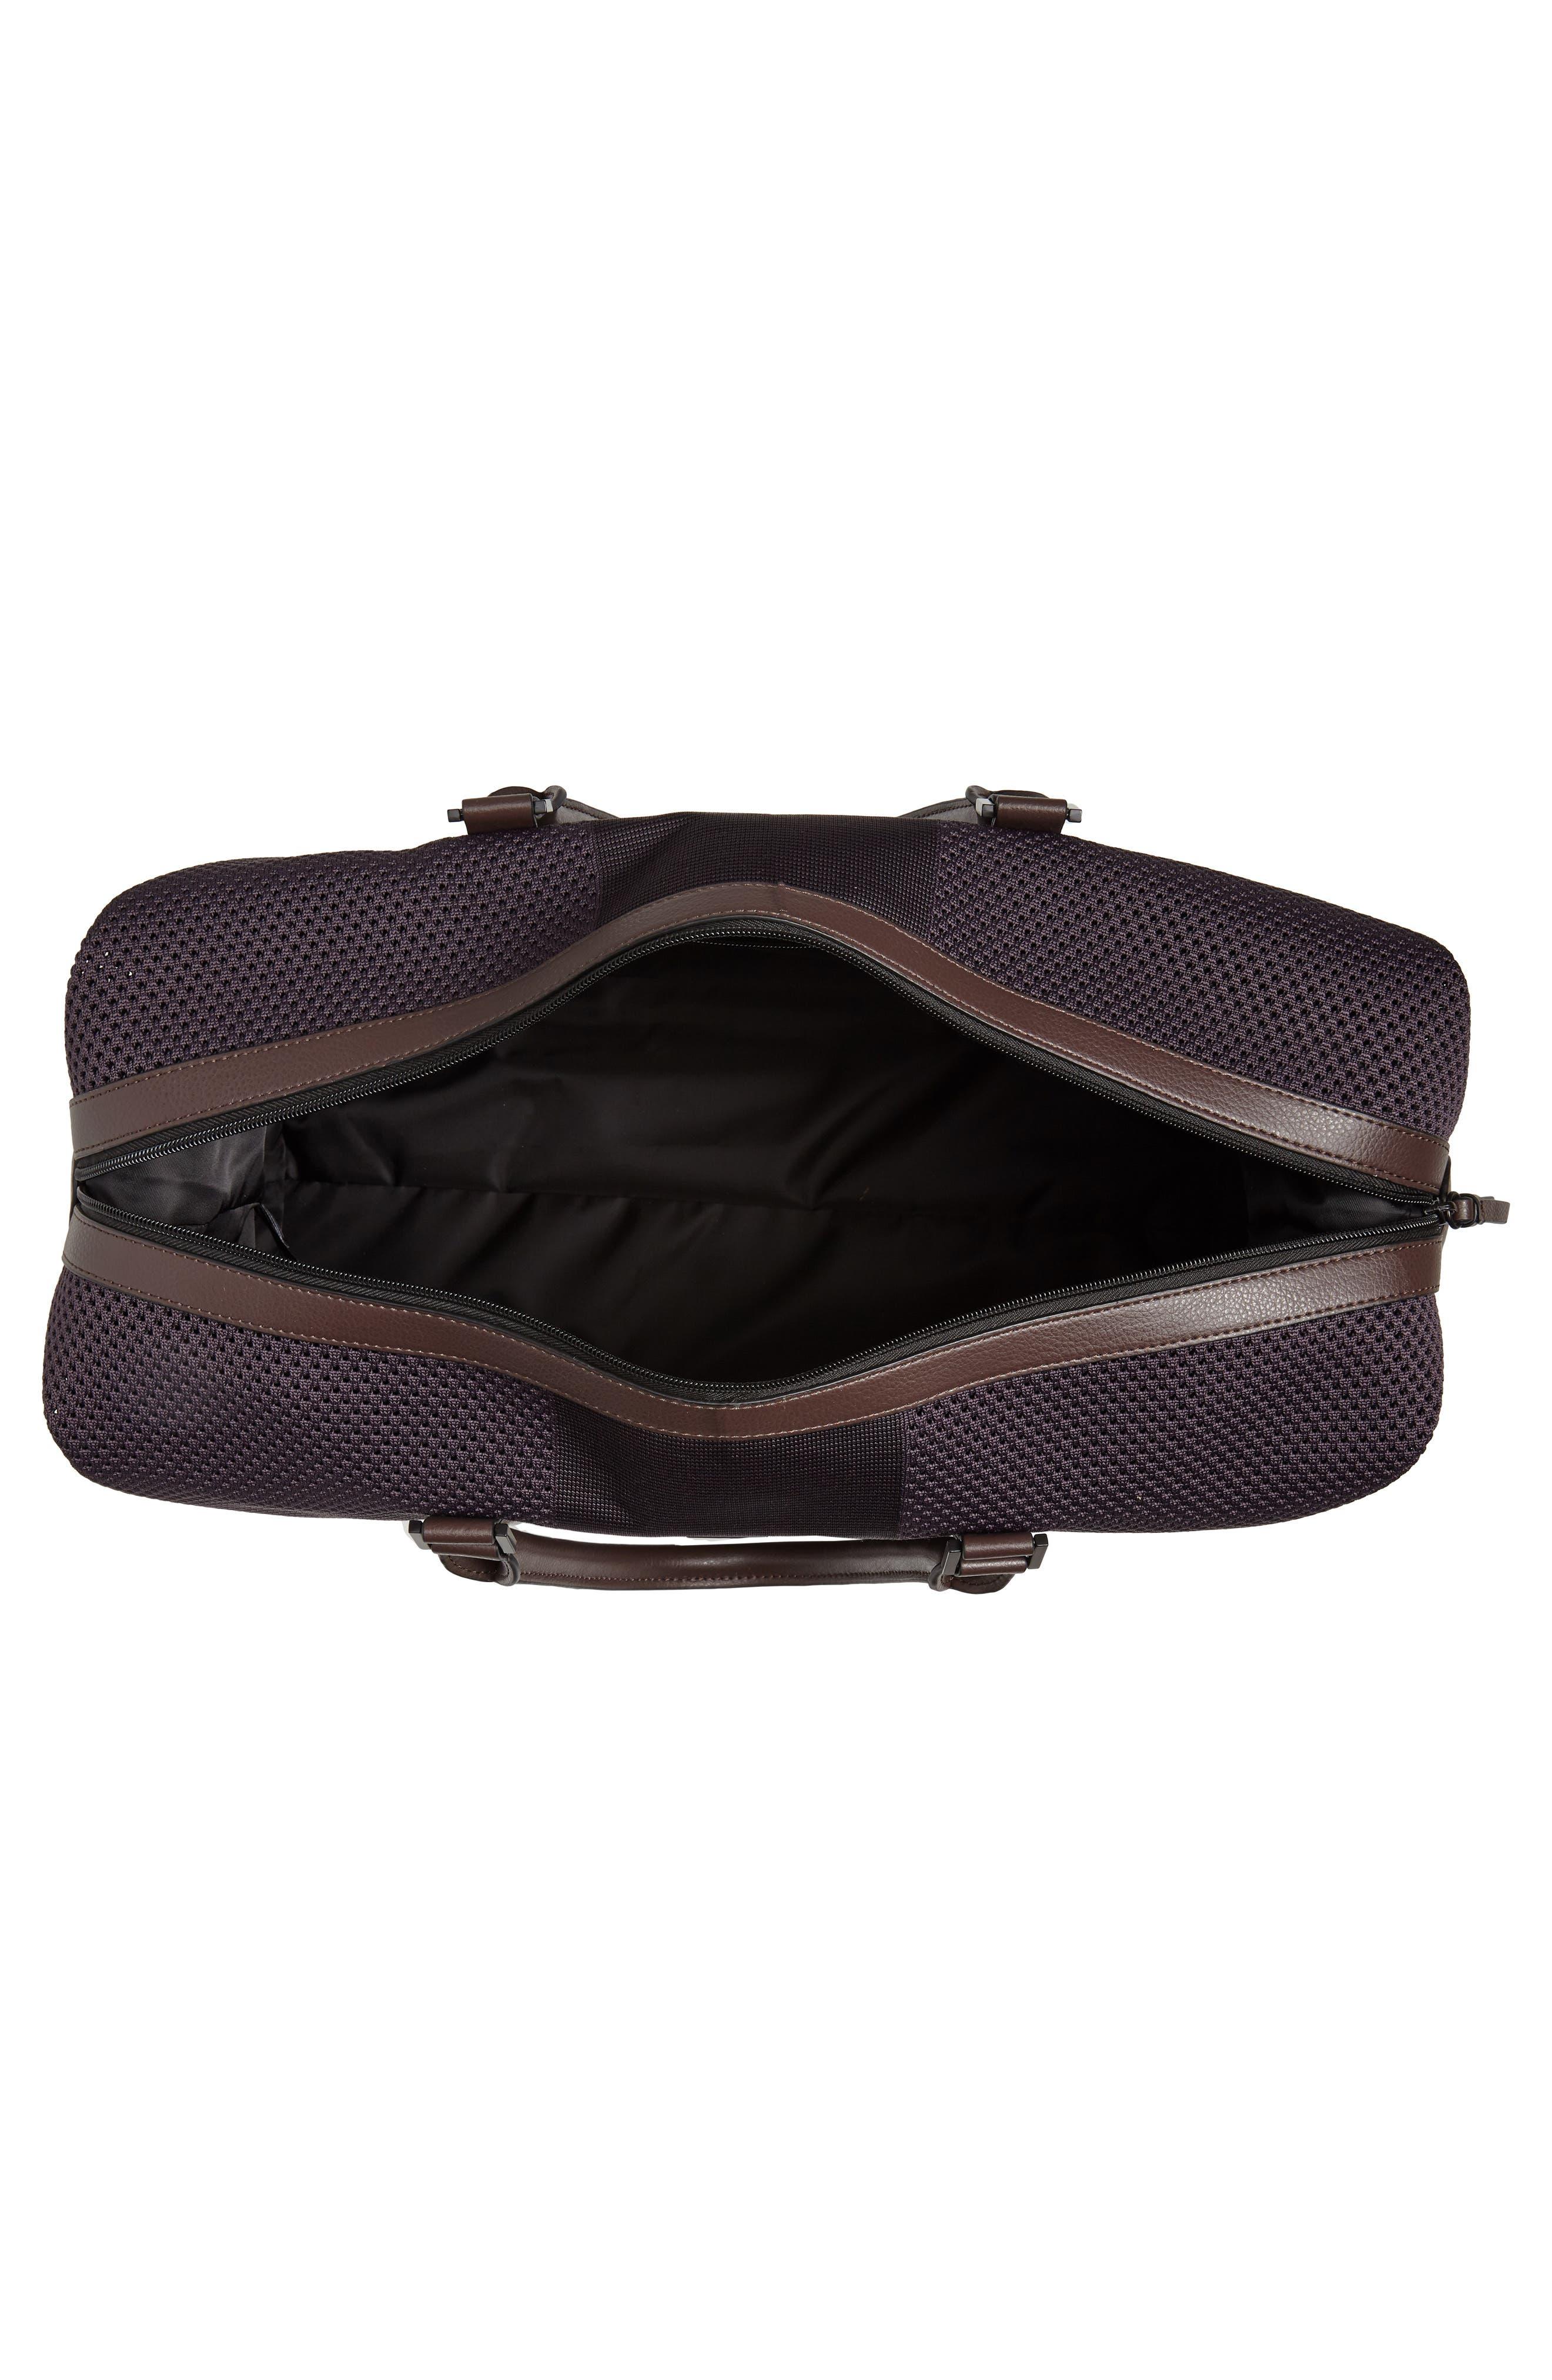 TED BAKER LONDON,                             Knit Holdall Duffel Bag,                             Alternate thumbnail 4, color,                             531